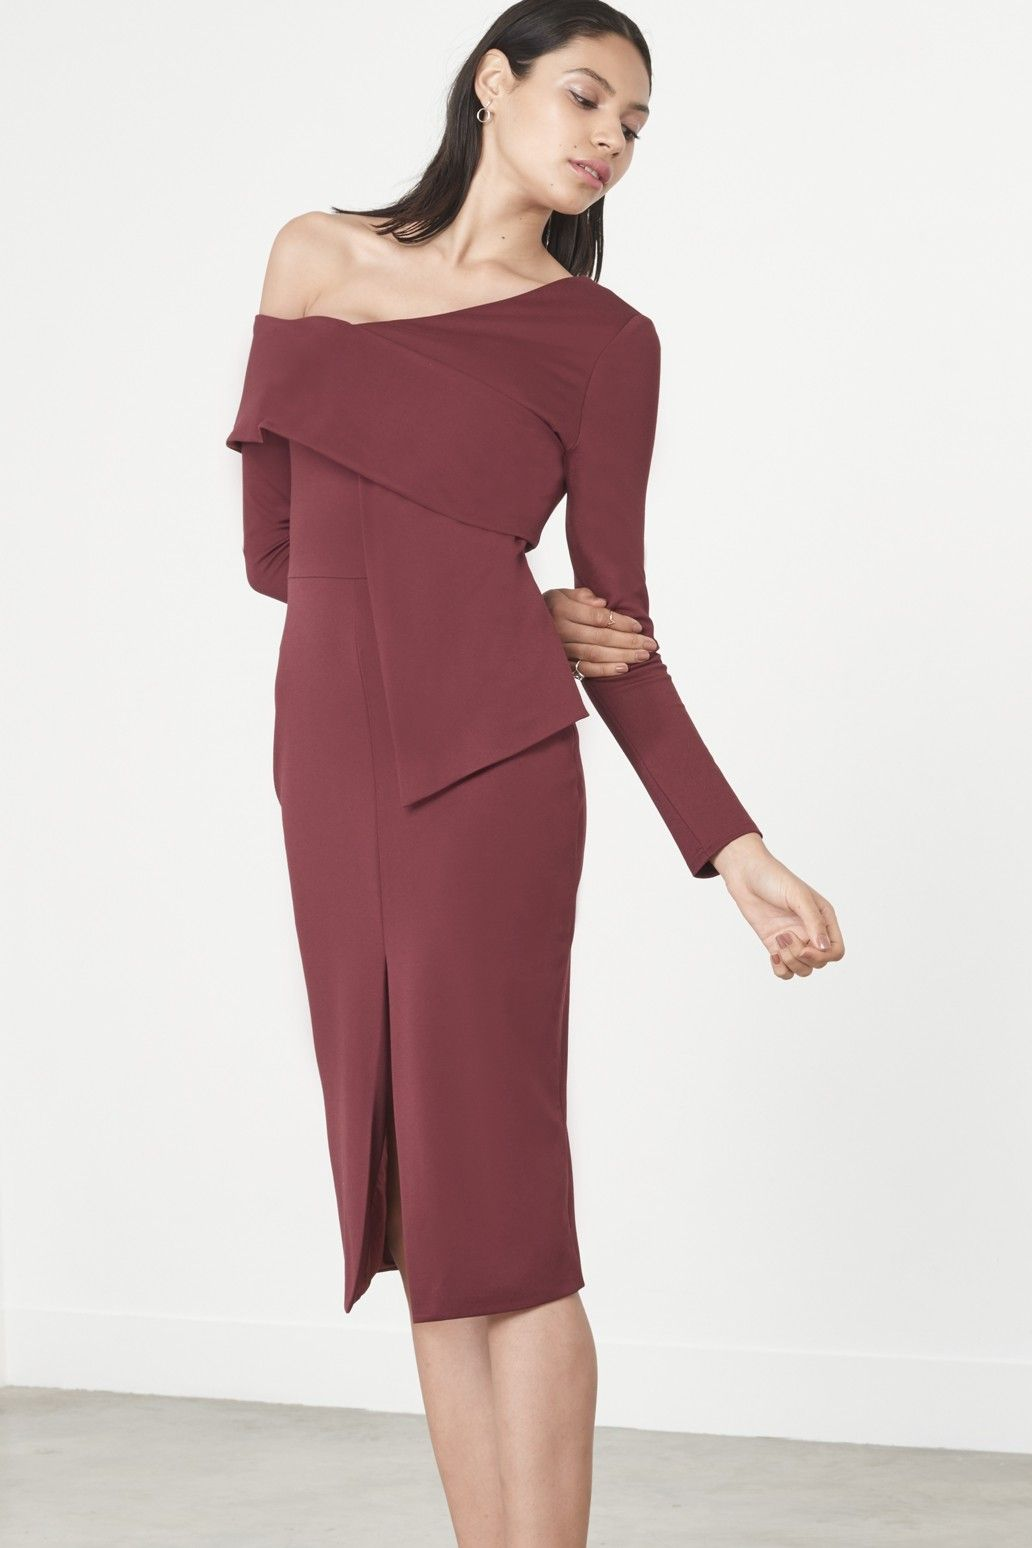 Wine Asymmetric Cold Shoulder Midi Dress. Gorgeous dress from Lavish Alice  - perfect for curvy types this Autumn Winter.  stylistpicks 2f1208ca5